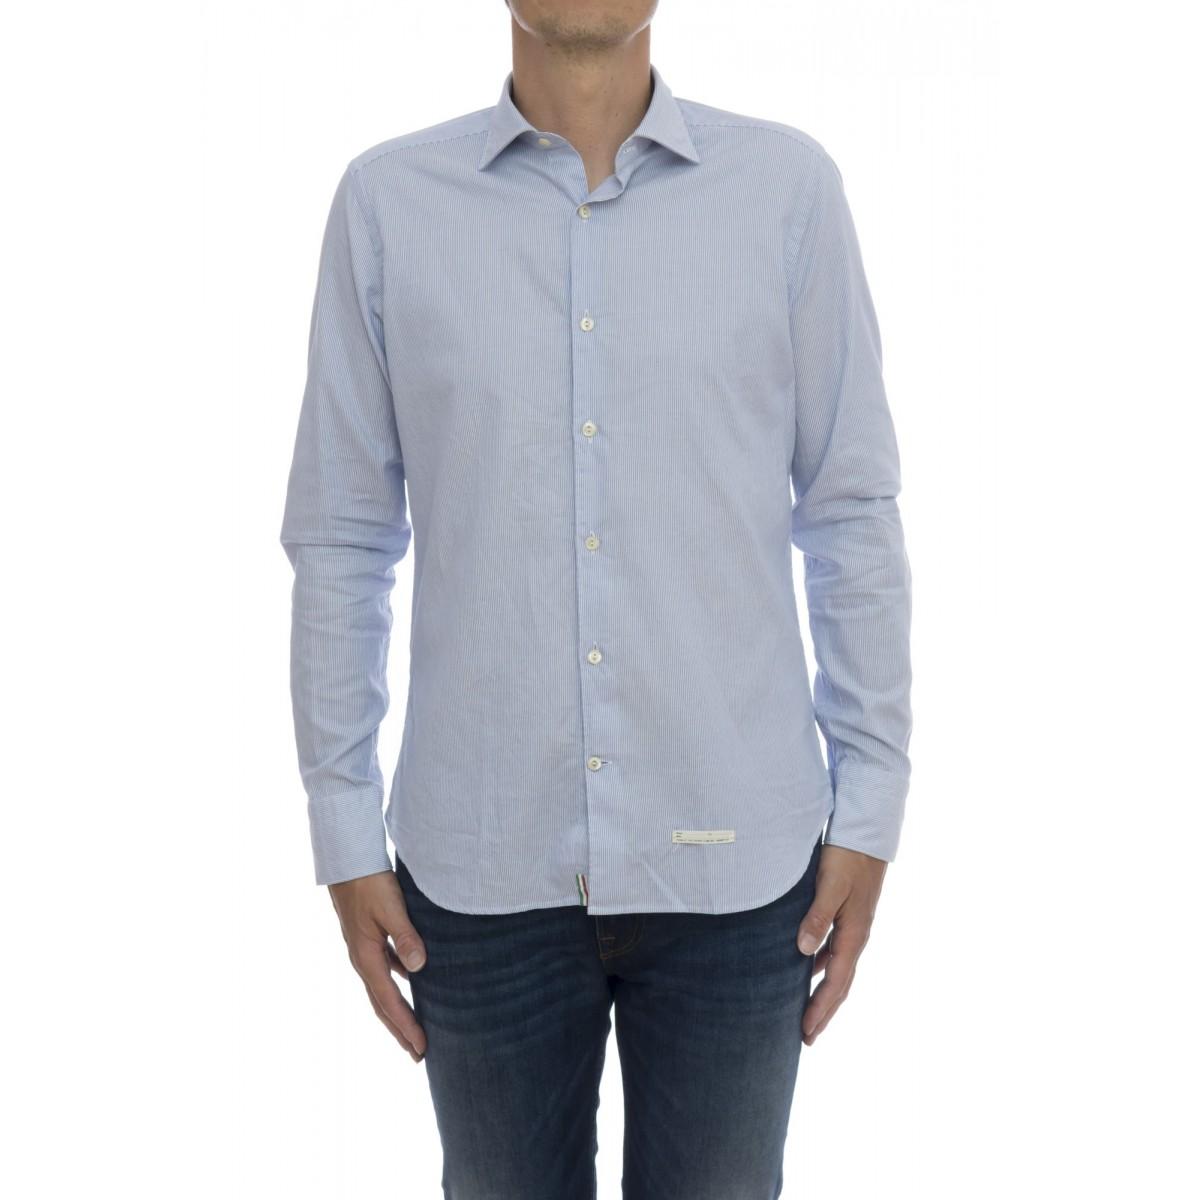 Camicia uomo - Ub1 njw camicia slim